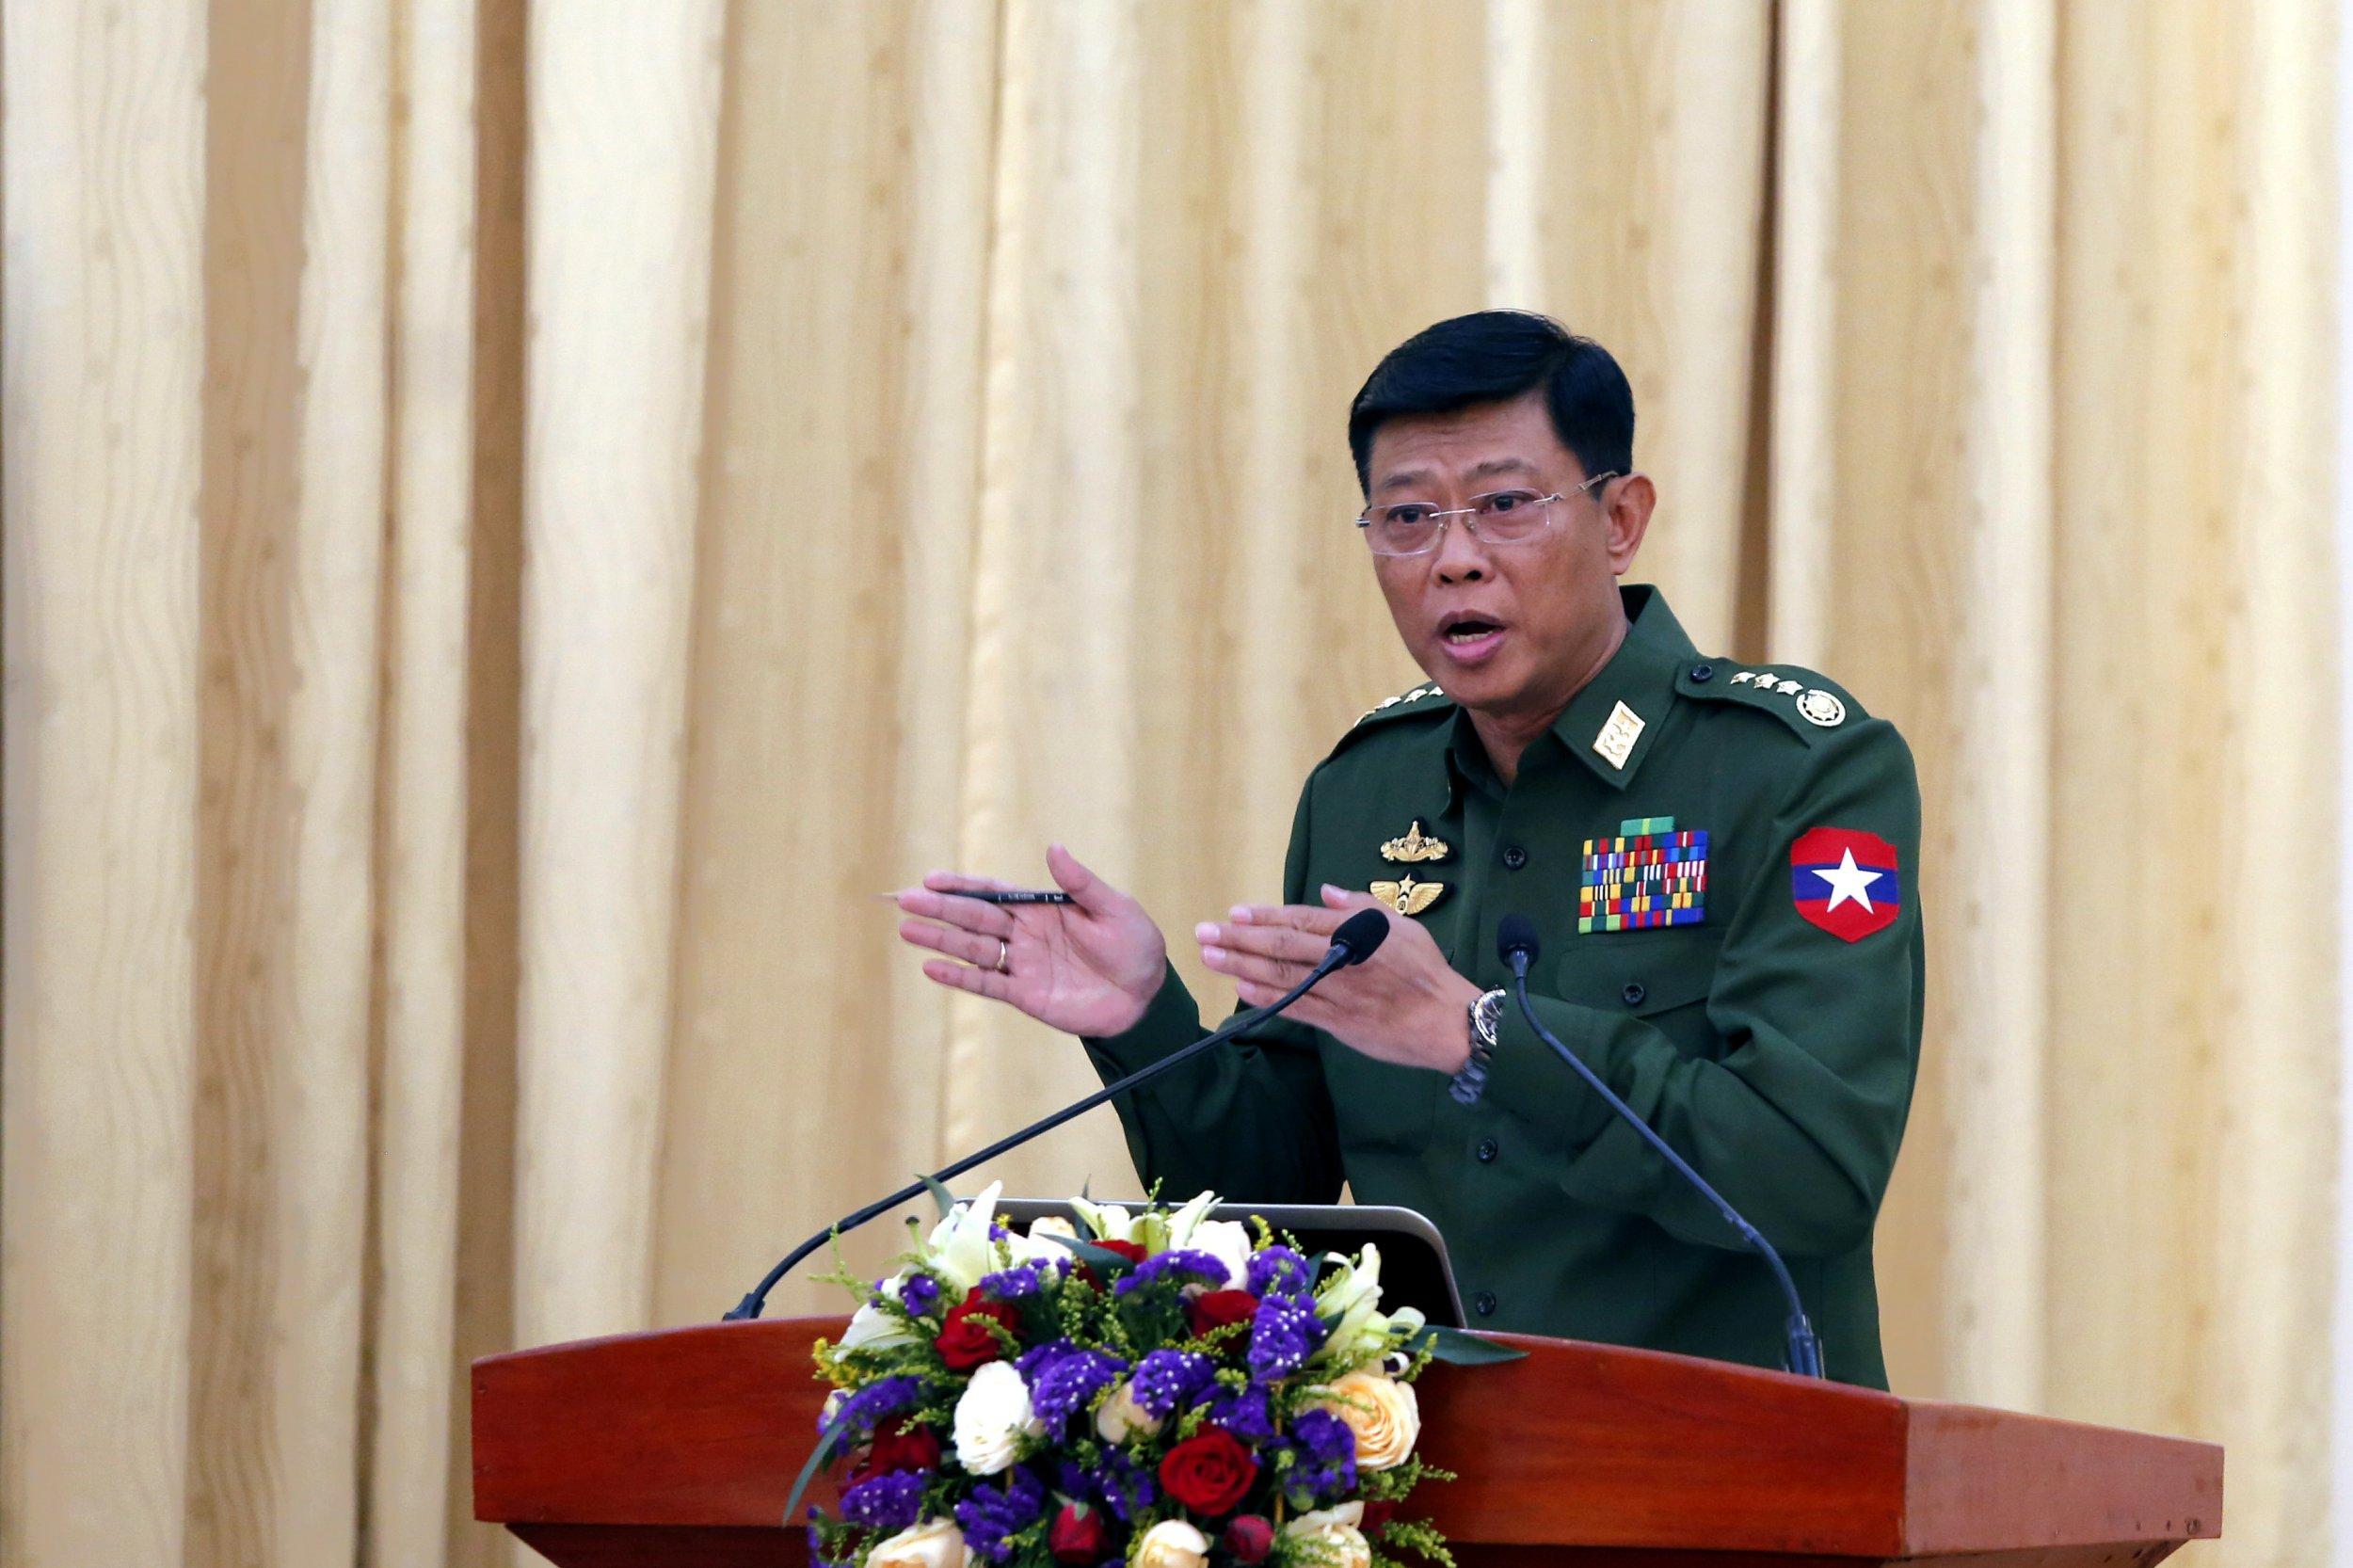 Myanmar's Chief of General Staff (Army,Navy and Air) Lieutenant General Mya Tun Oo